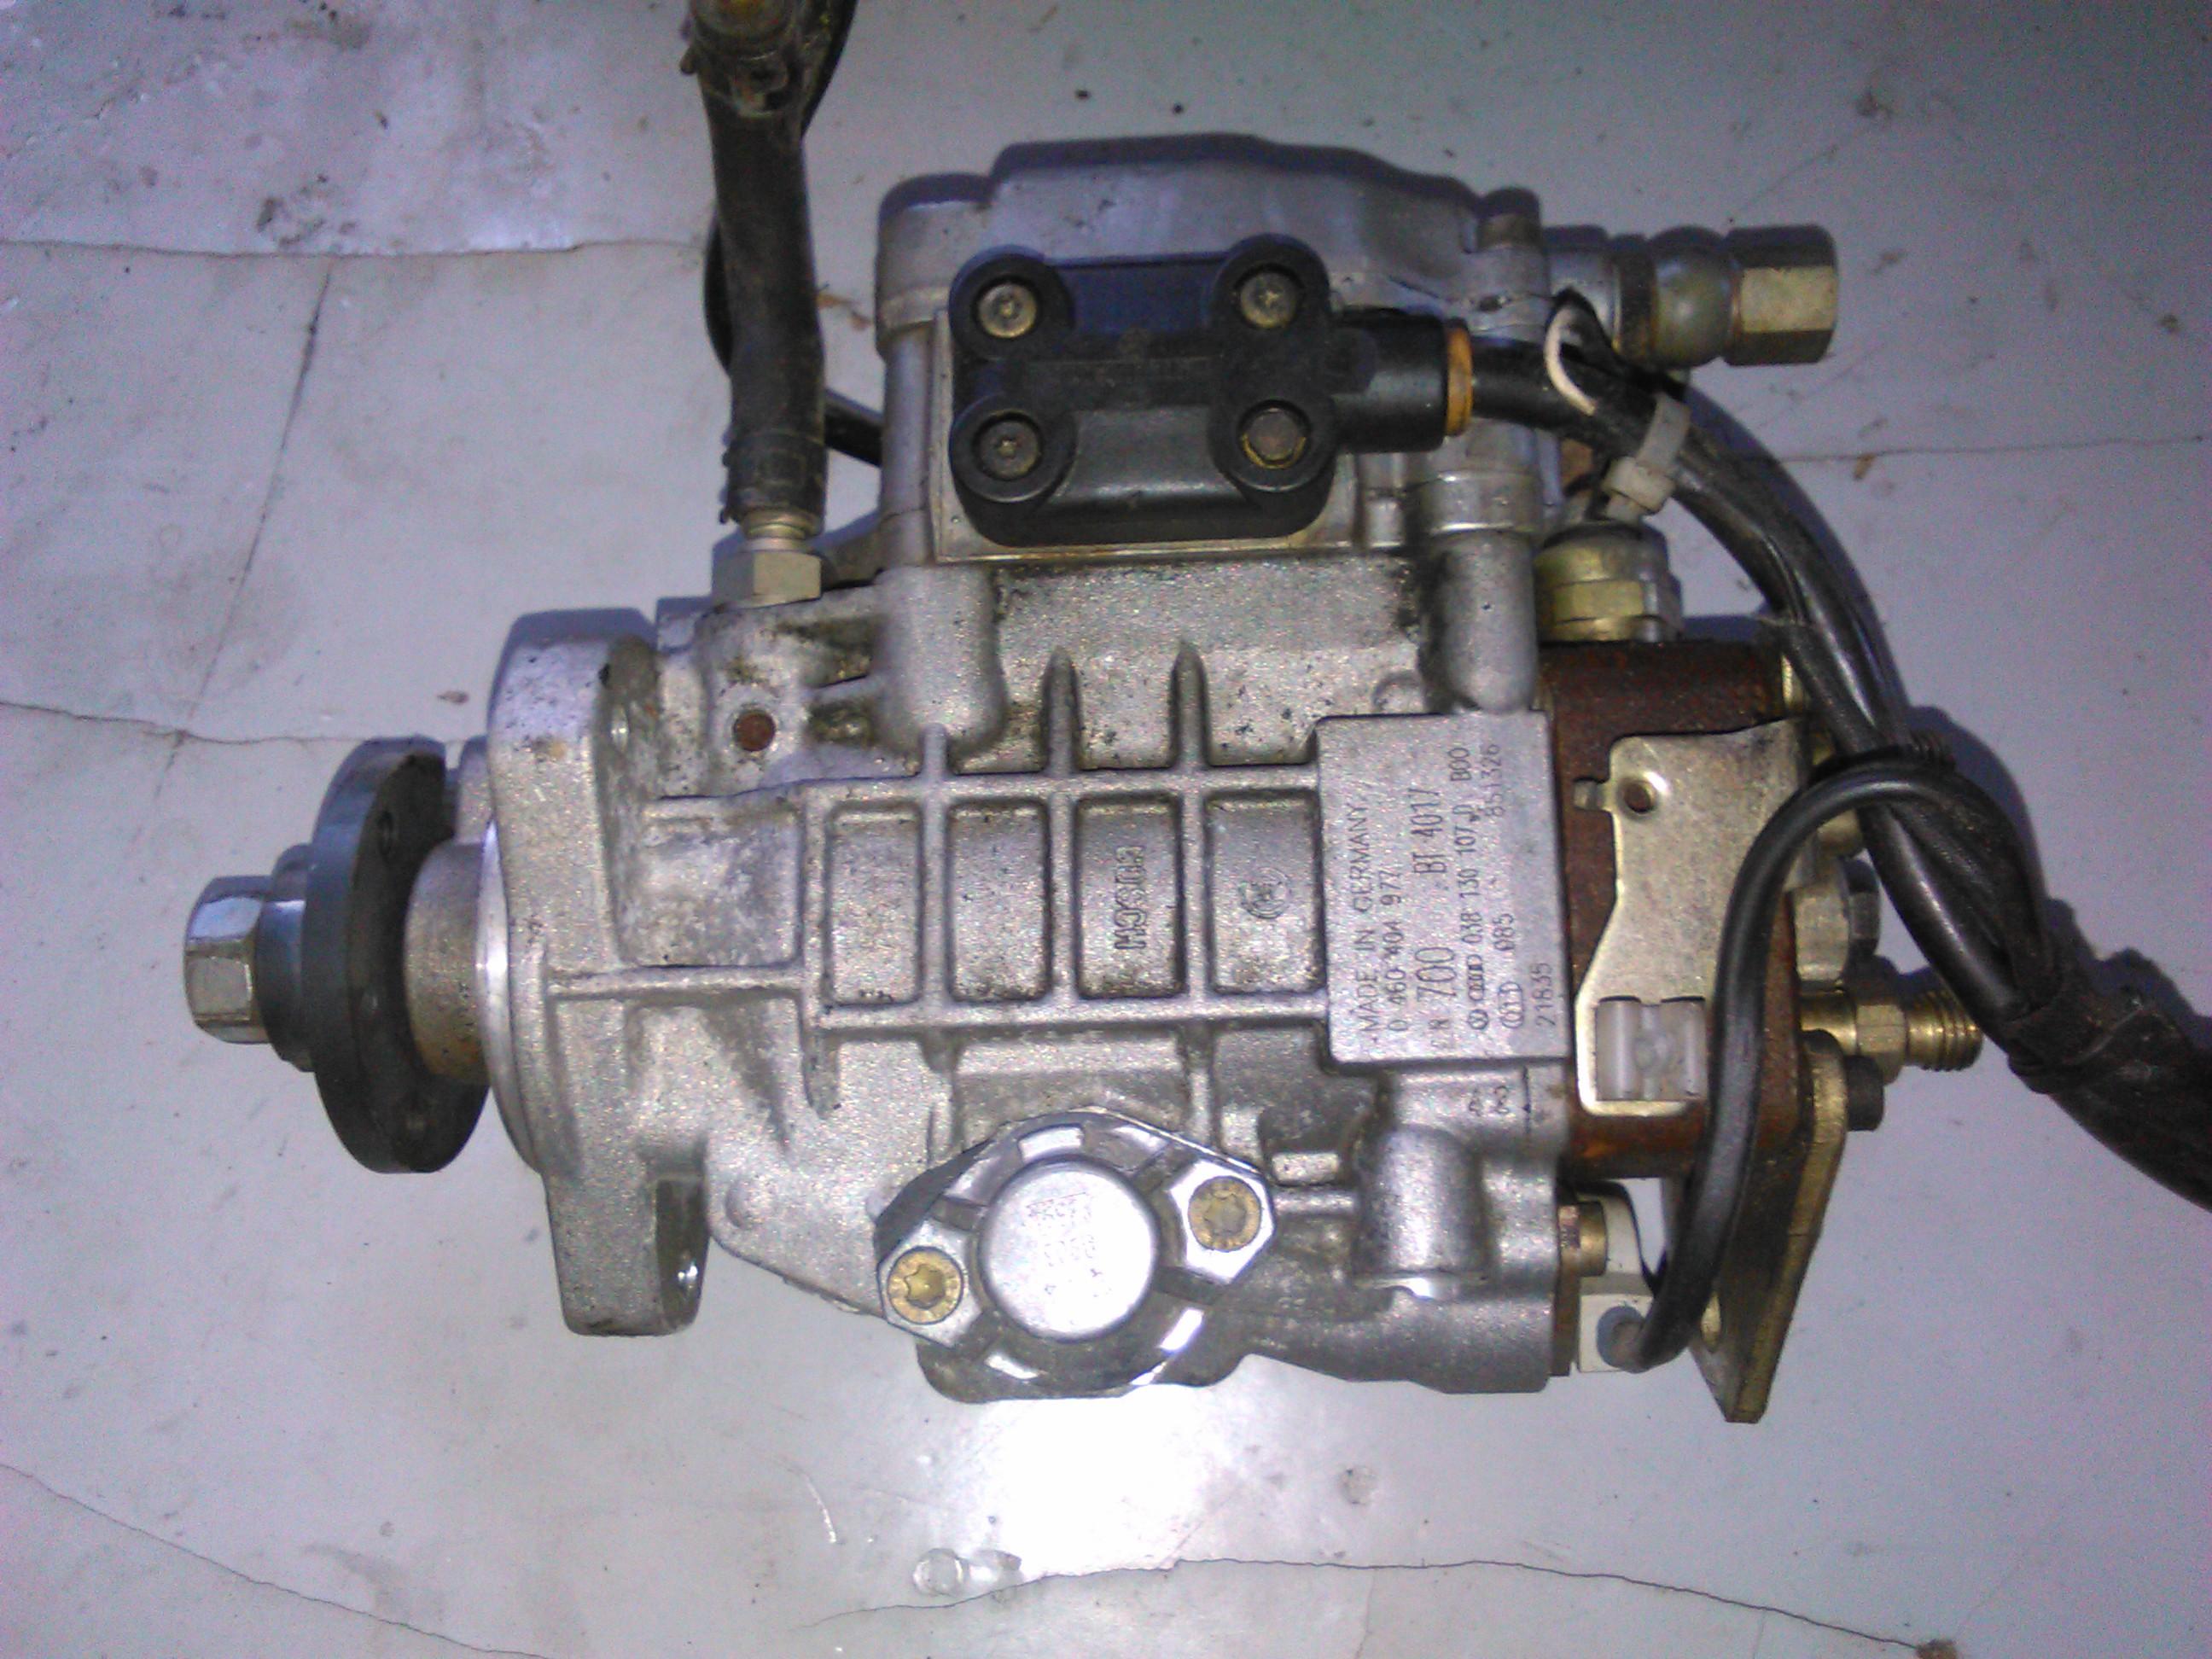 Pompa de injectie Vw Golf IV 1.9tdi motor ALH cod 0460404977